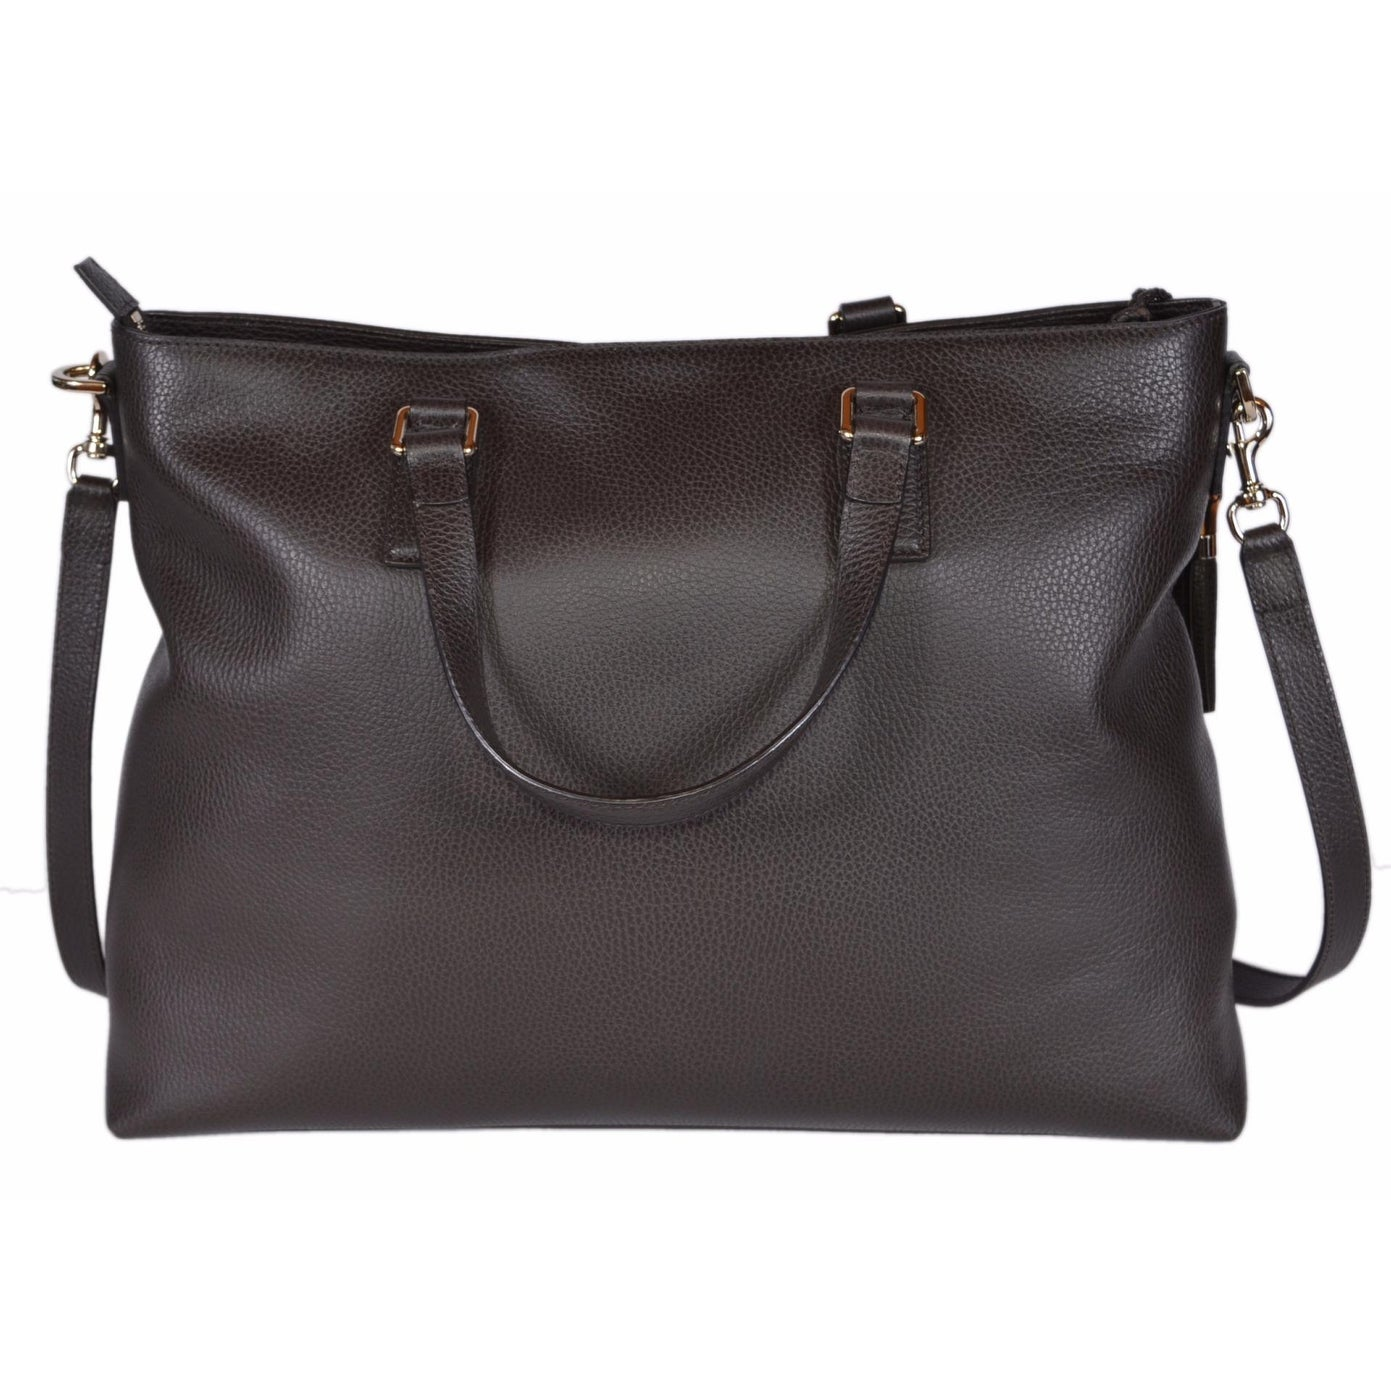 aeb20f35260 Shop Gucci 365345 Large Brown Leather Bamboo Tassel Crossbody Handbag Purse  - 18